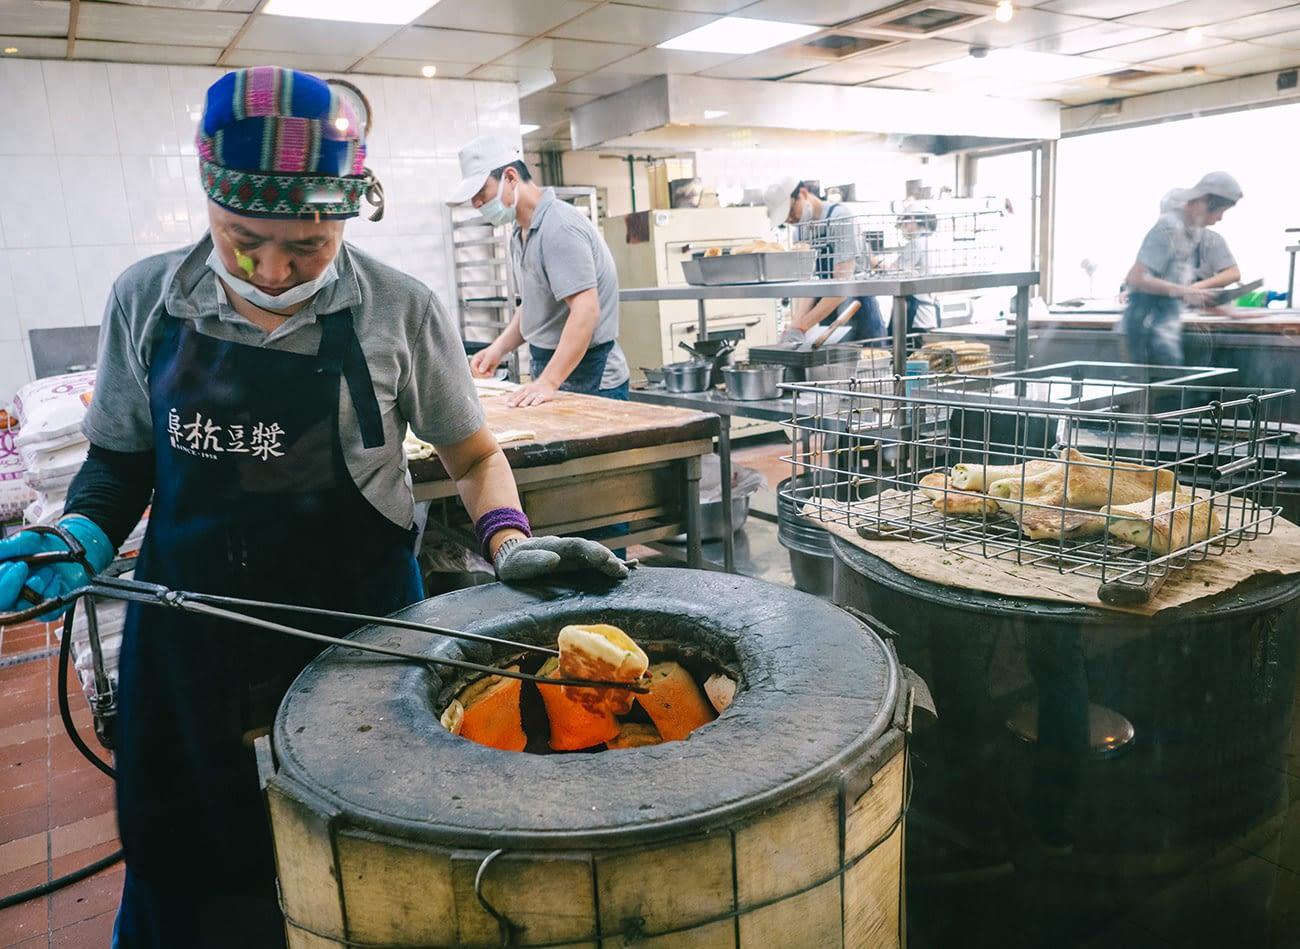 Fu Hang Dou Jiang - Toasting Bread